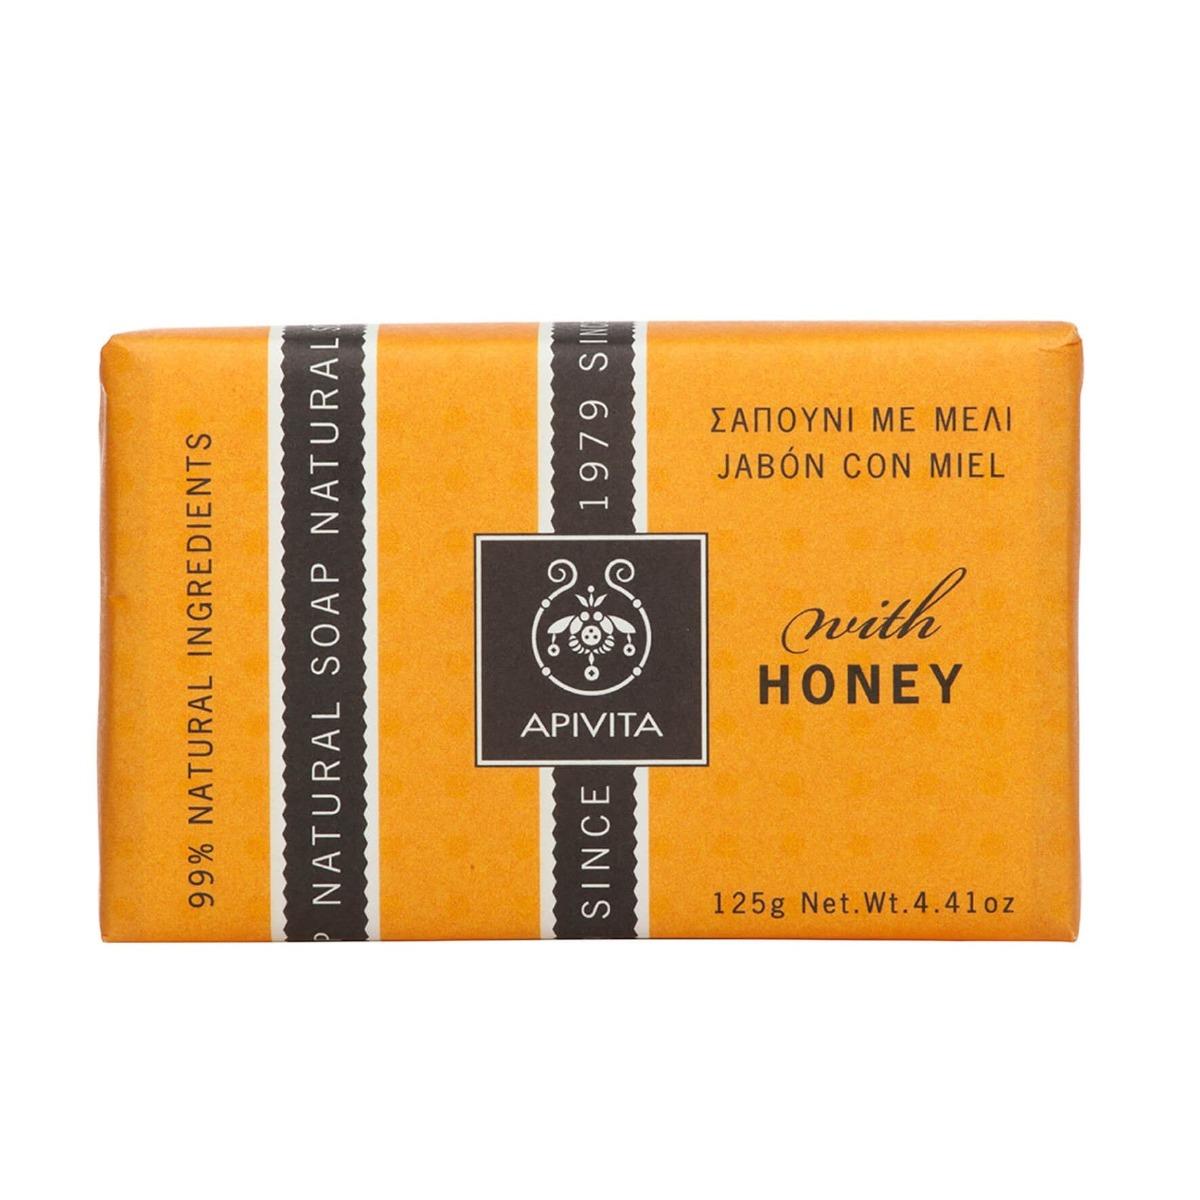 Apivita Sapun natural cu miere 125g